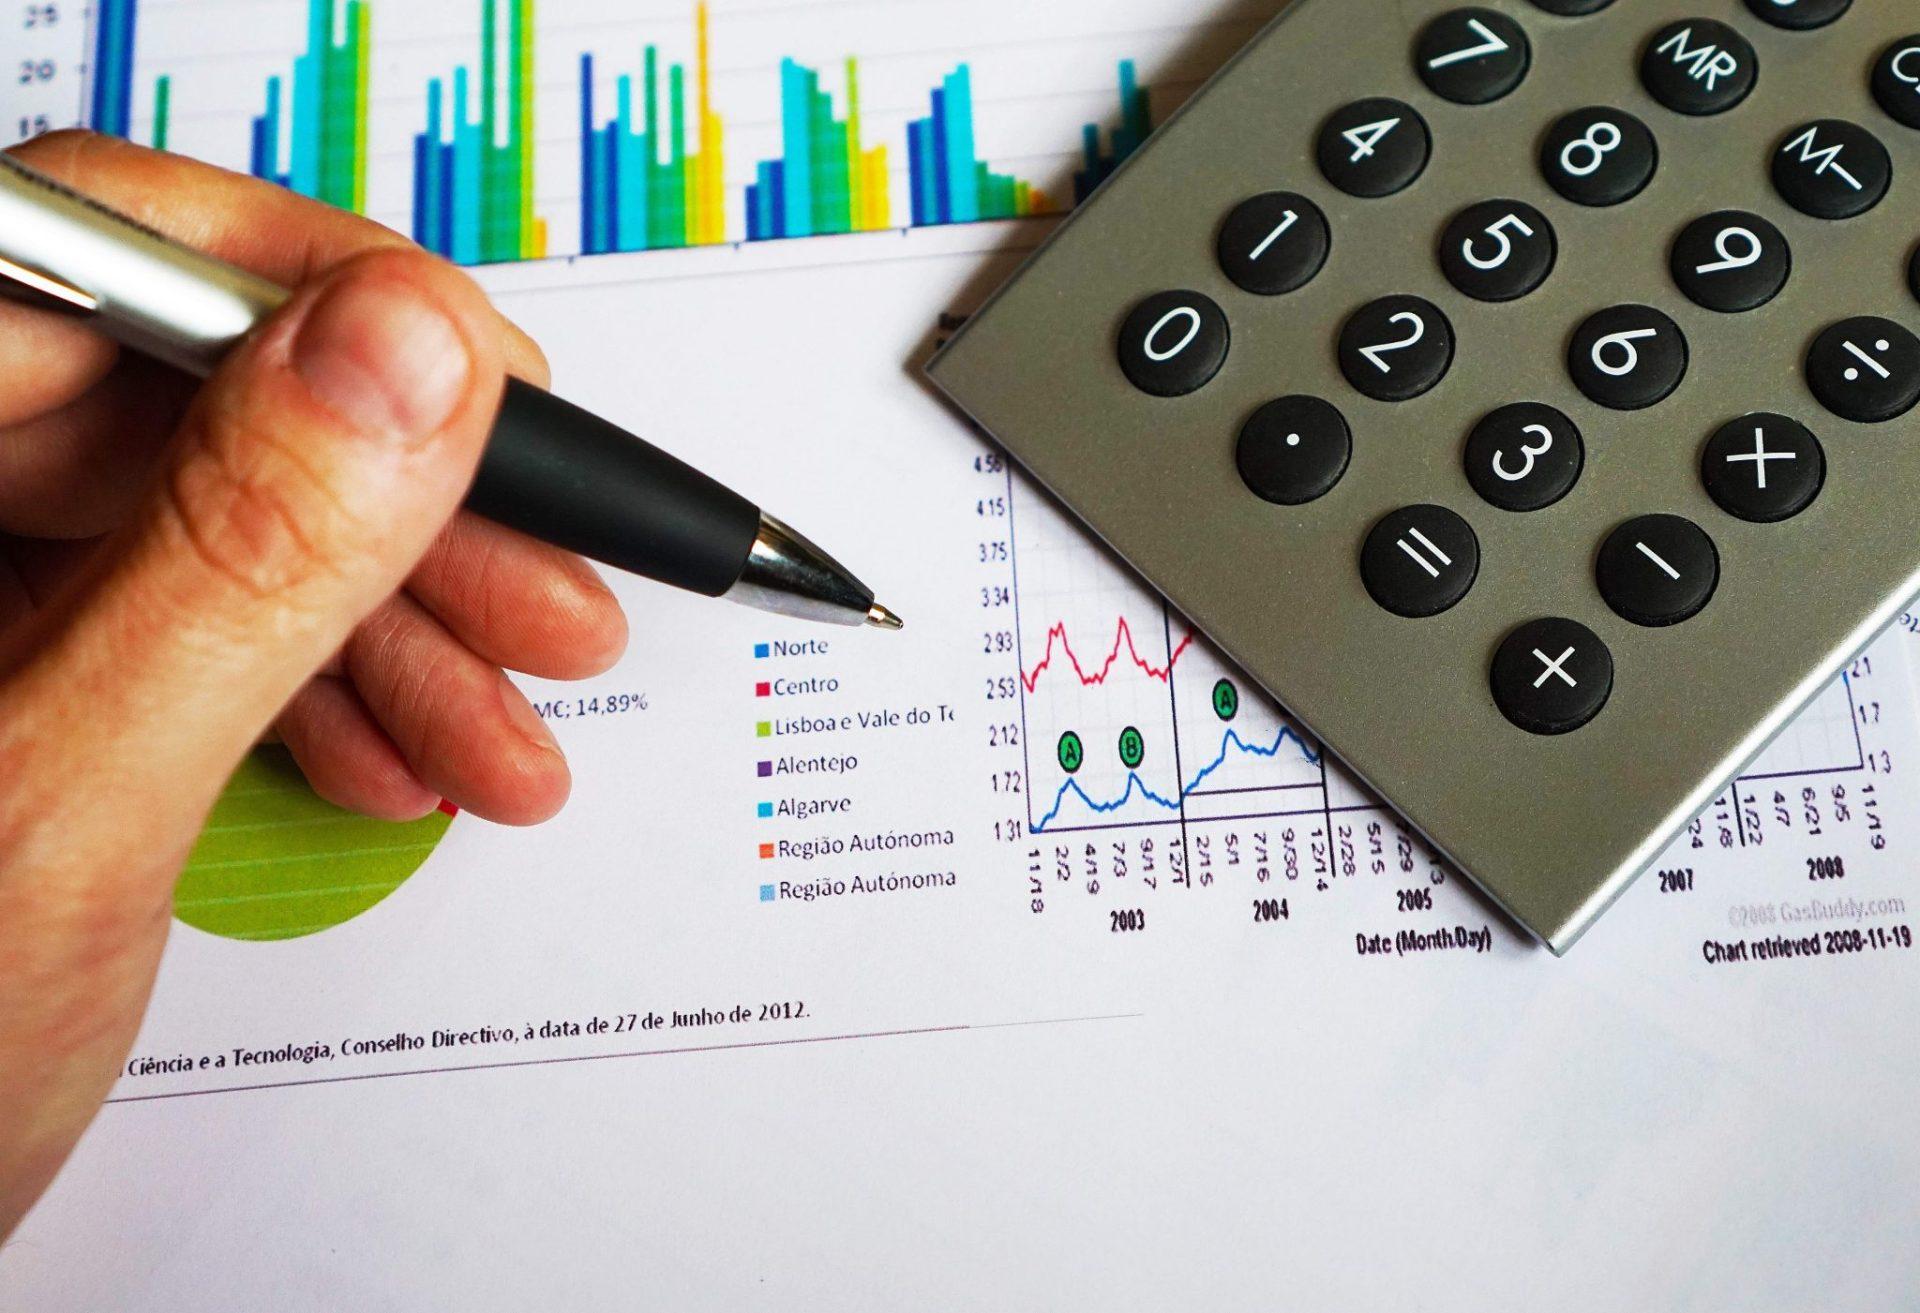 CFO, finance manager, management accountant, funding, cost savings, revenue pipeline, Kiaban, JIT, working capital, debtors management, risk management